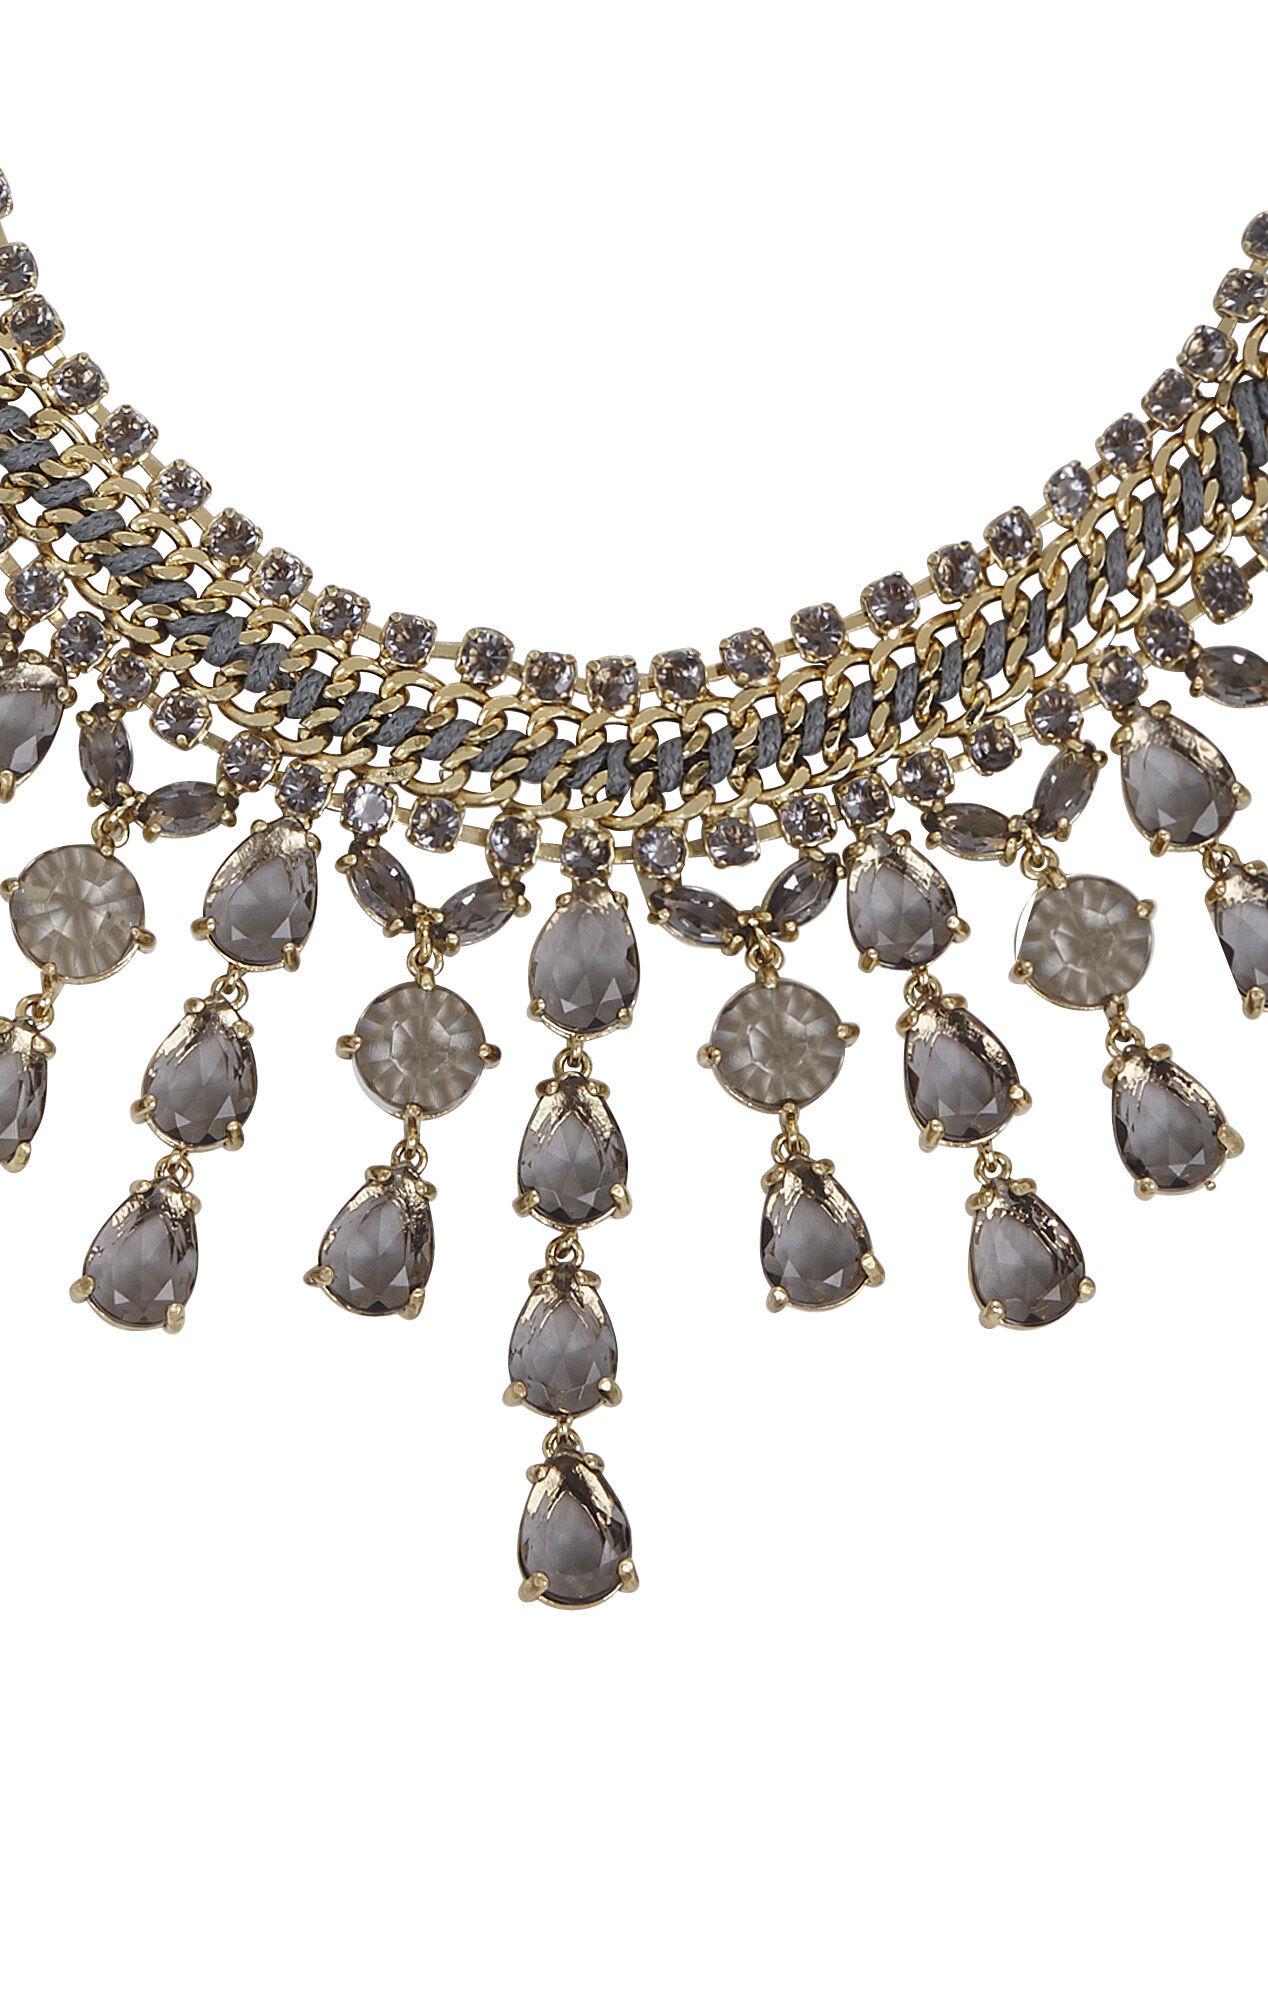 Corded Gemstone Necklace